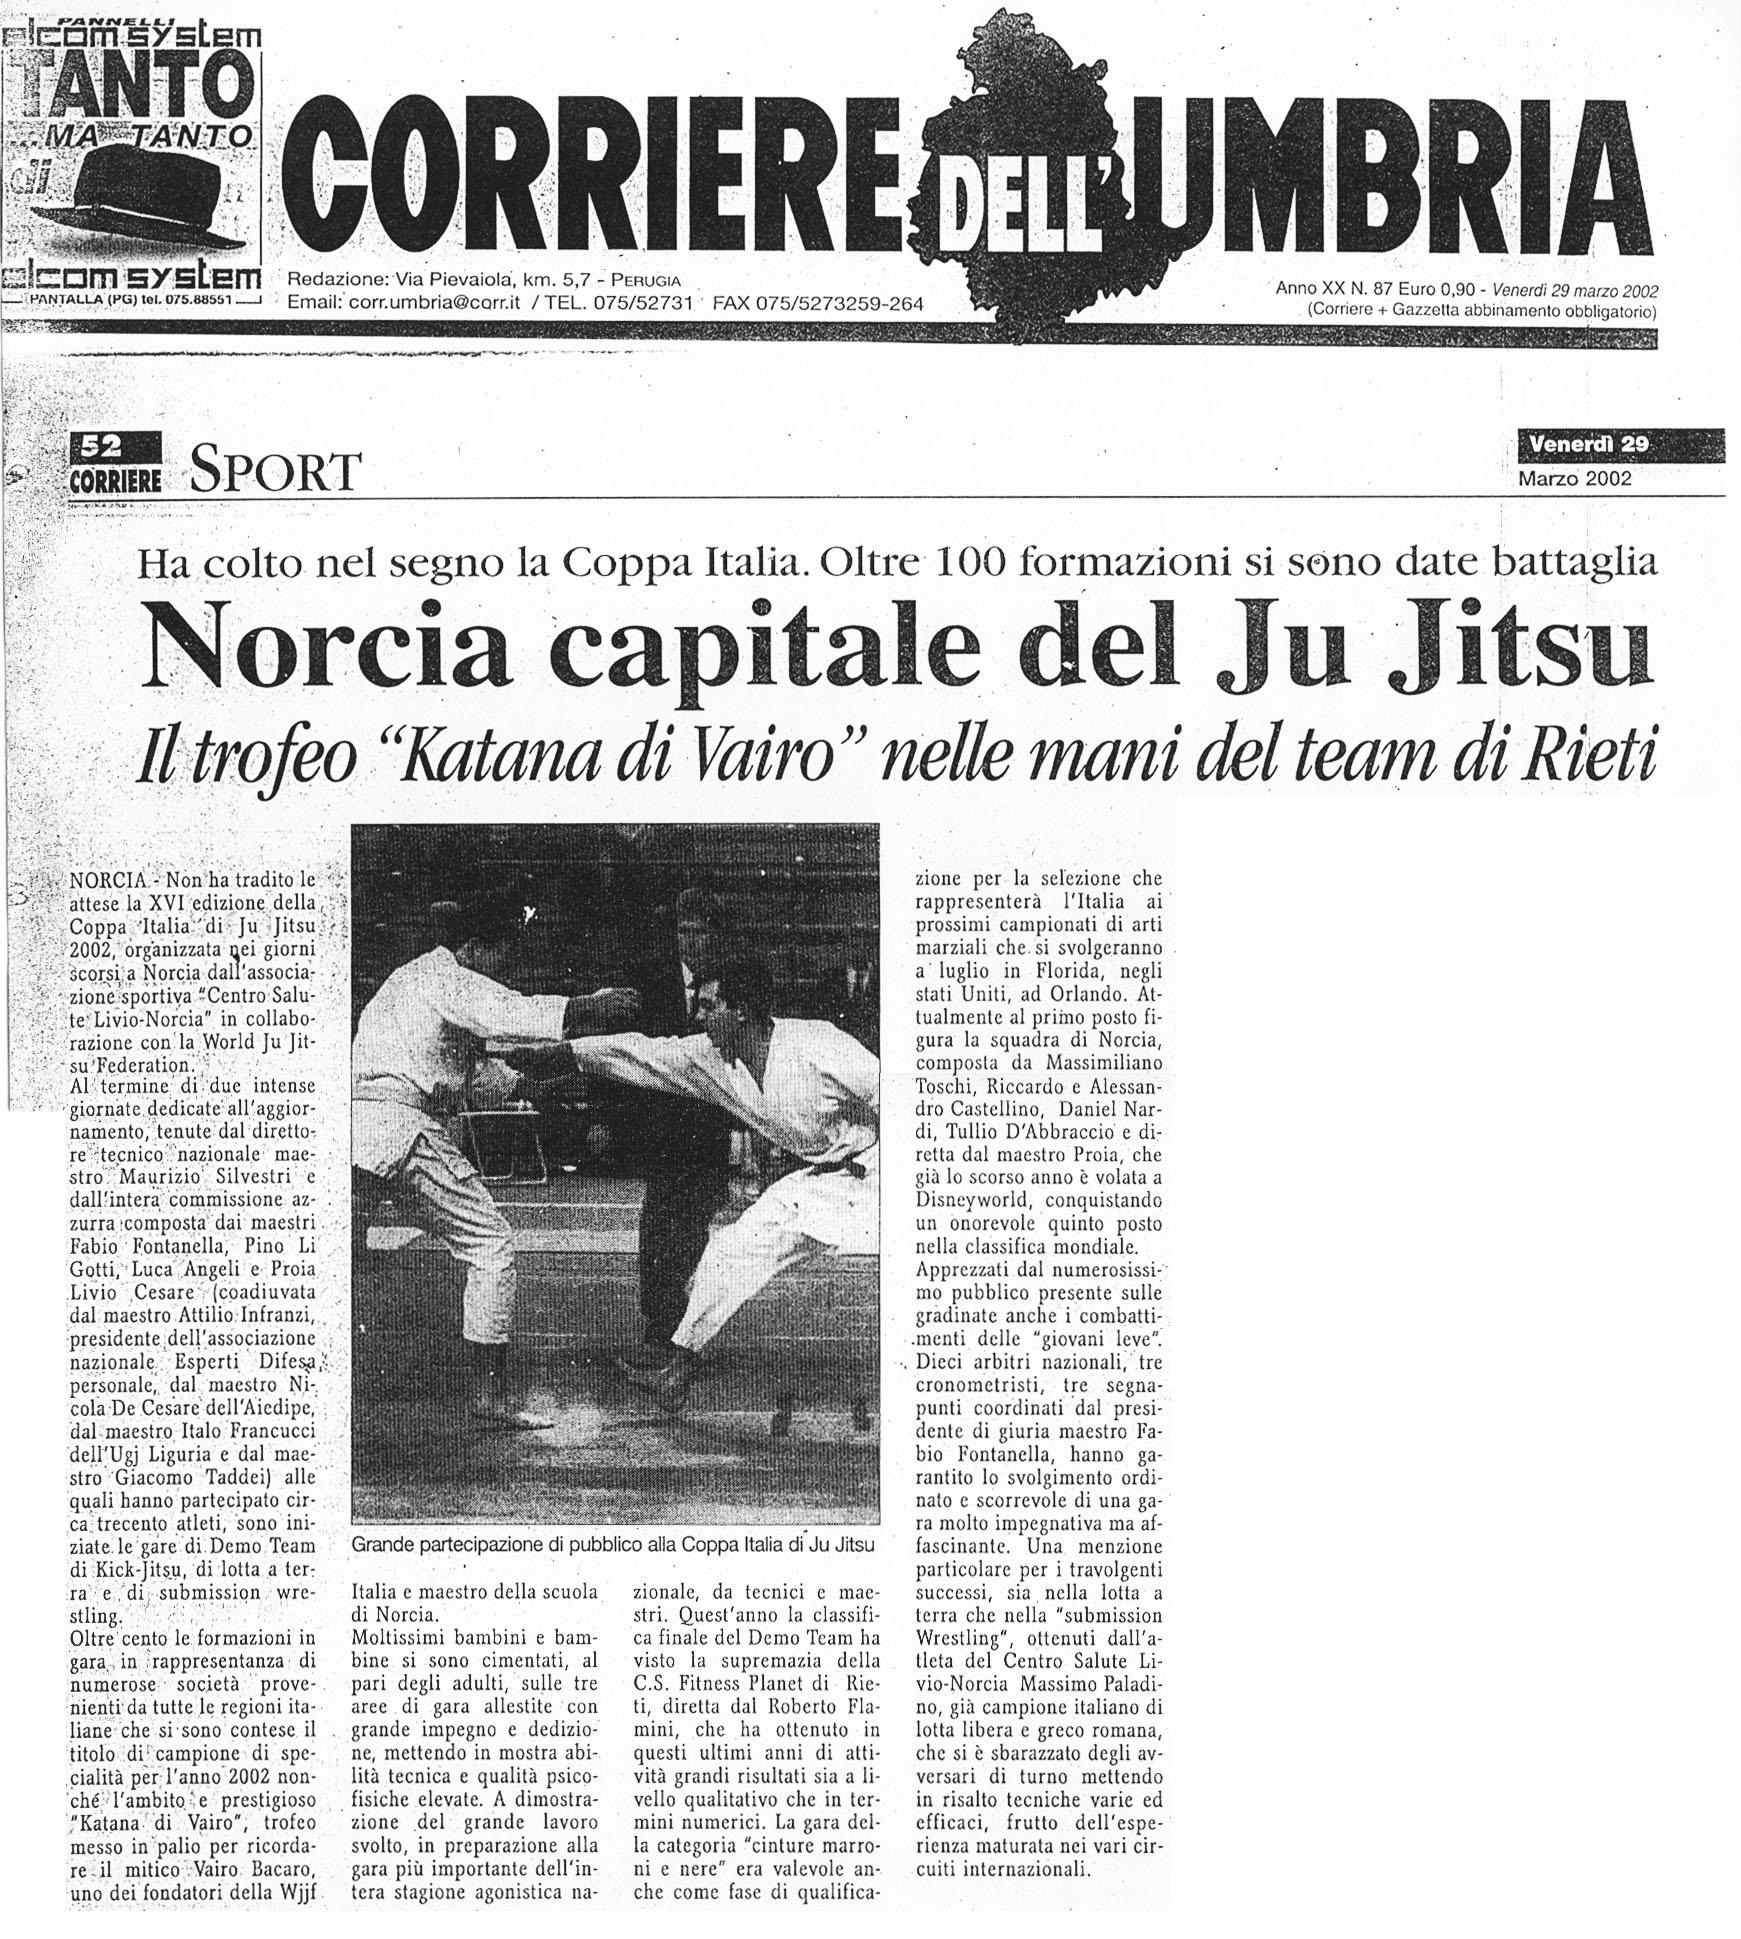 2002 Corriere dell'Umbria